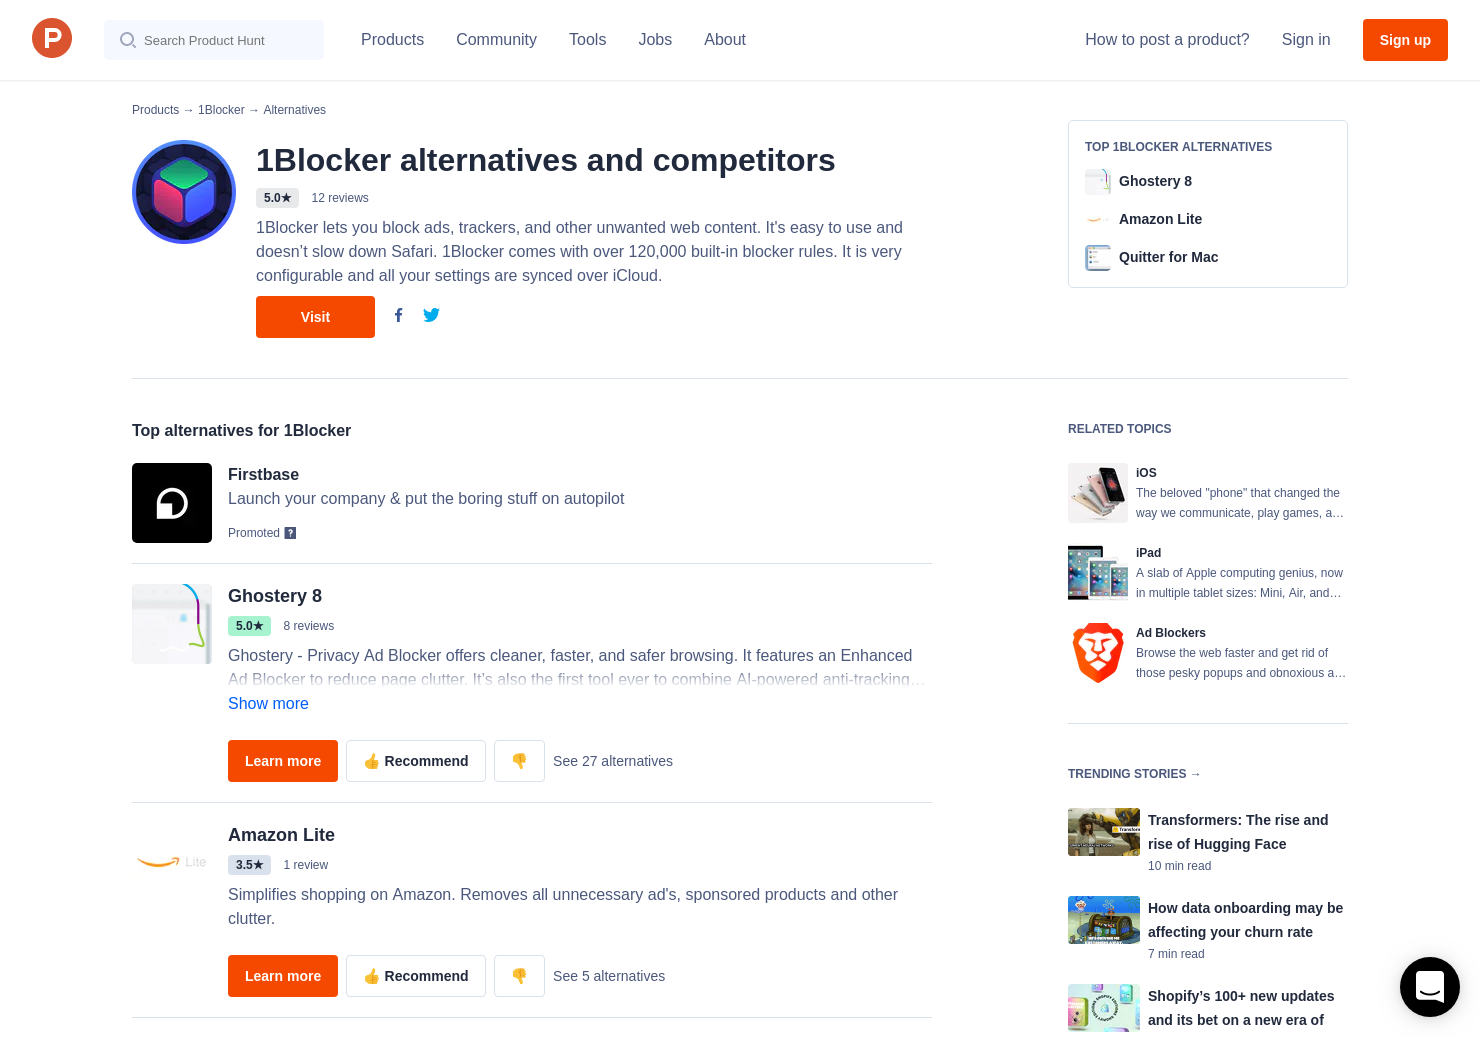 22 Alternatives to 1Blocker for iPhone, iPad   Product Hunt